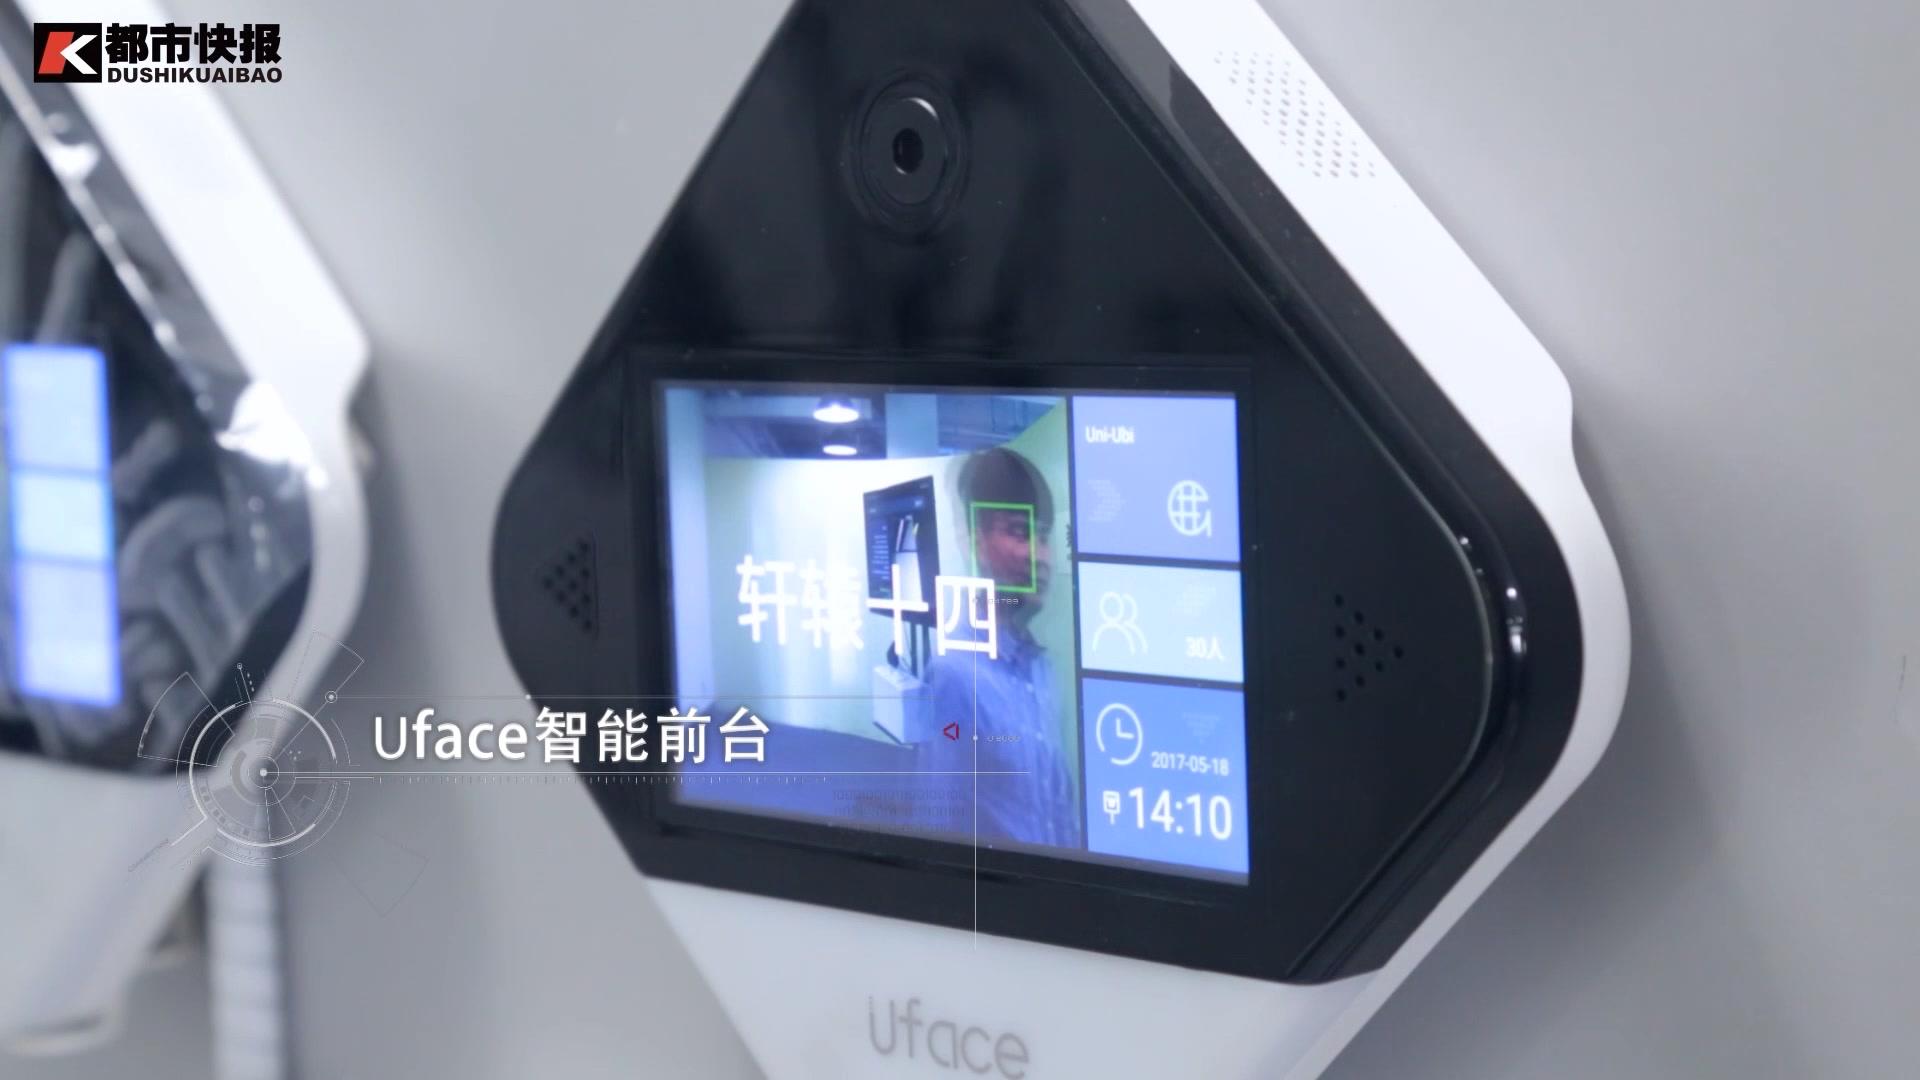 uface智能前台:人脸识别技术掀起了一场考勤变革